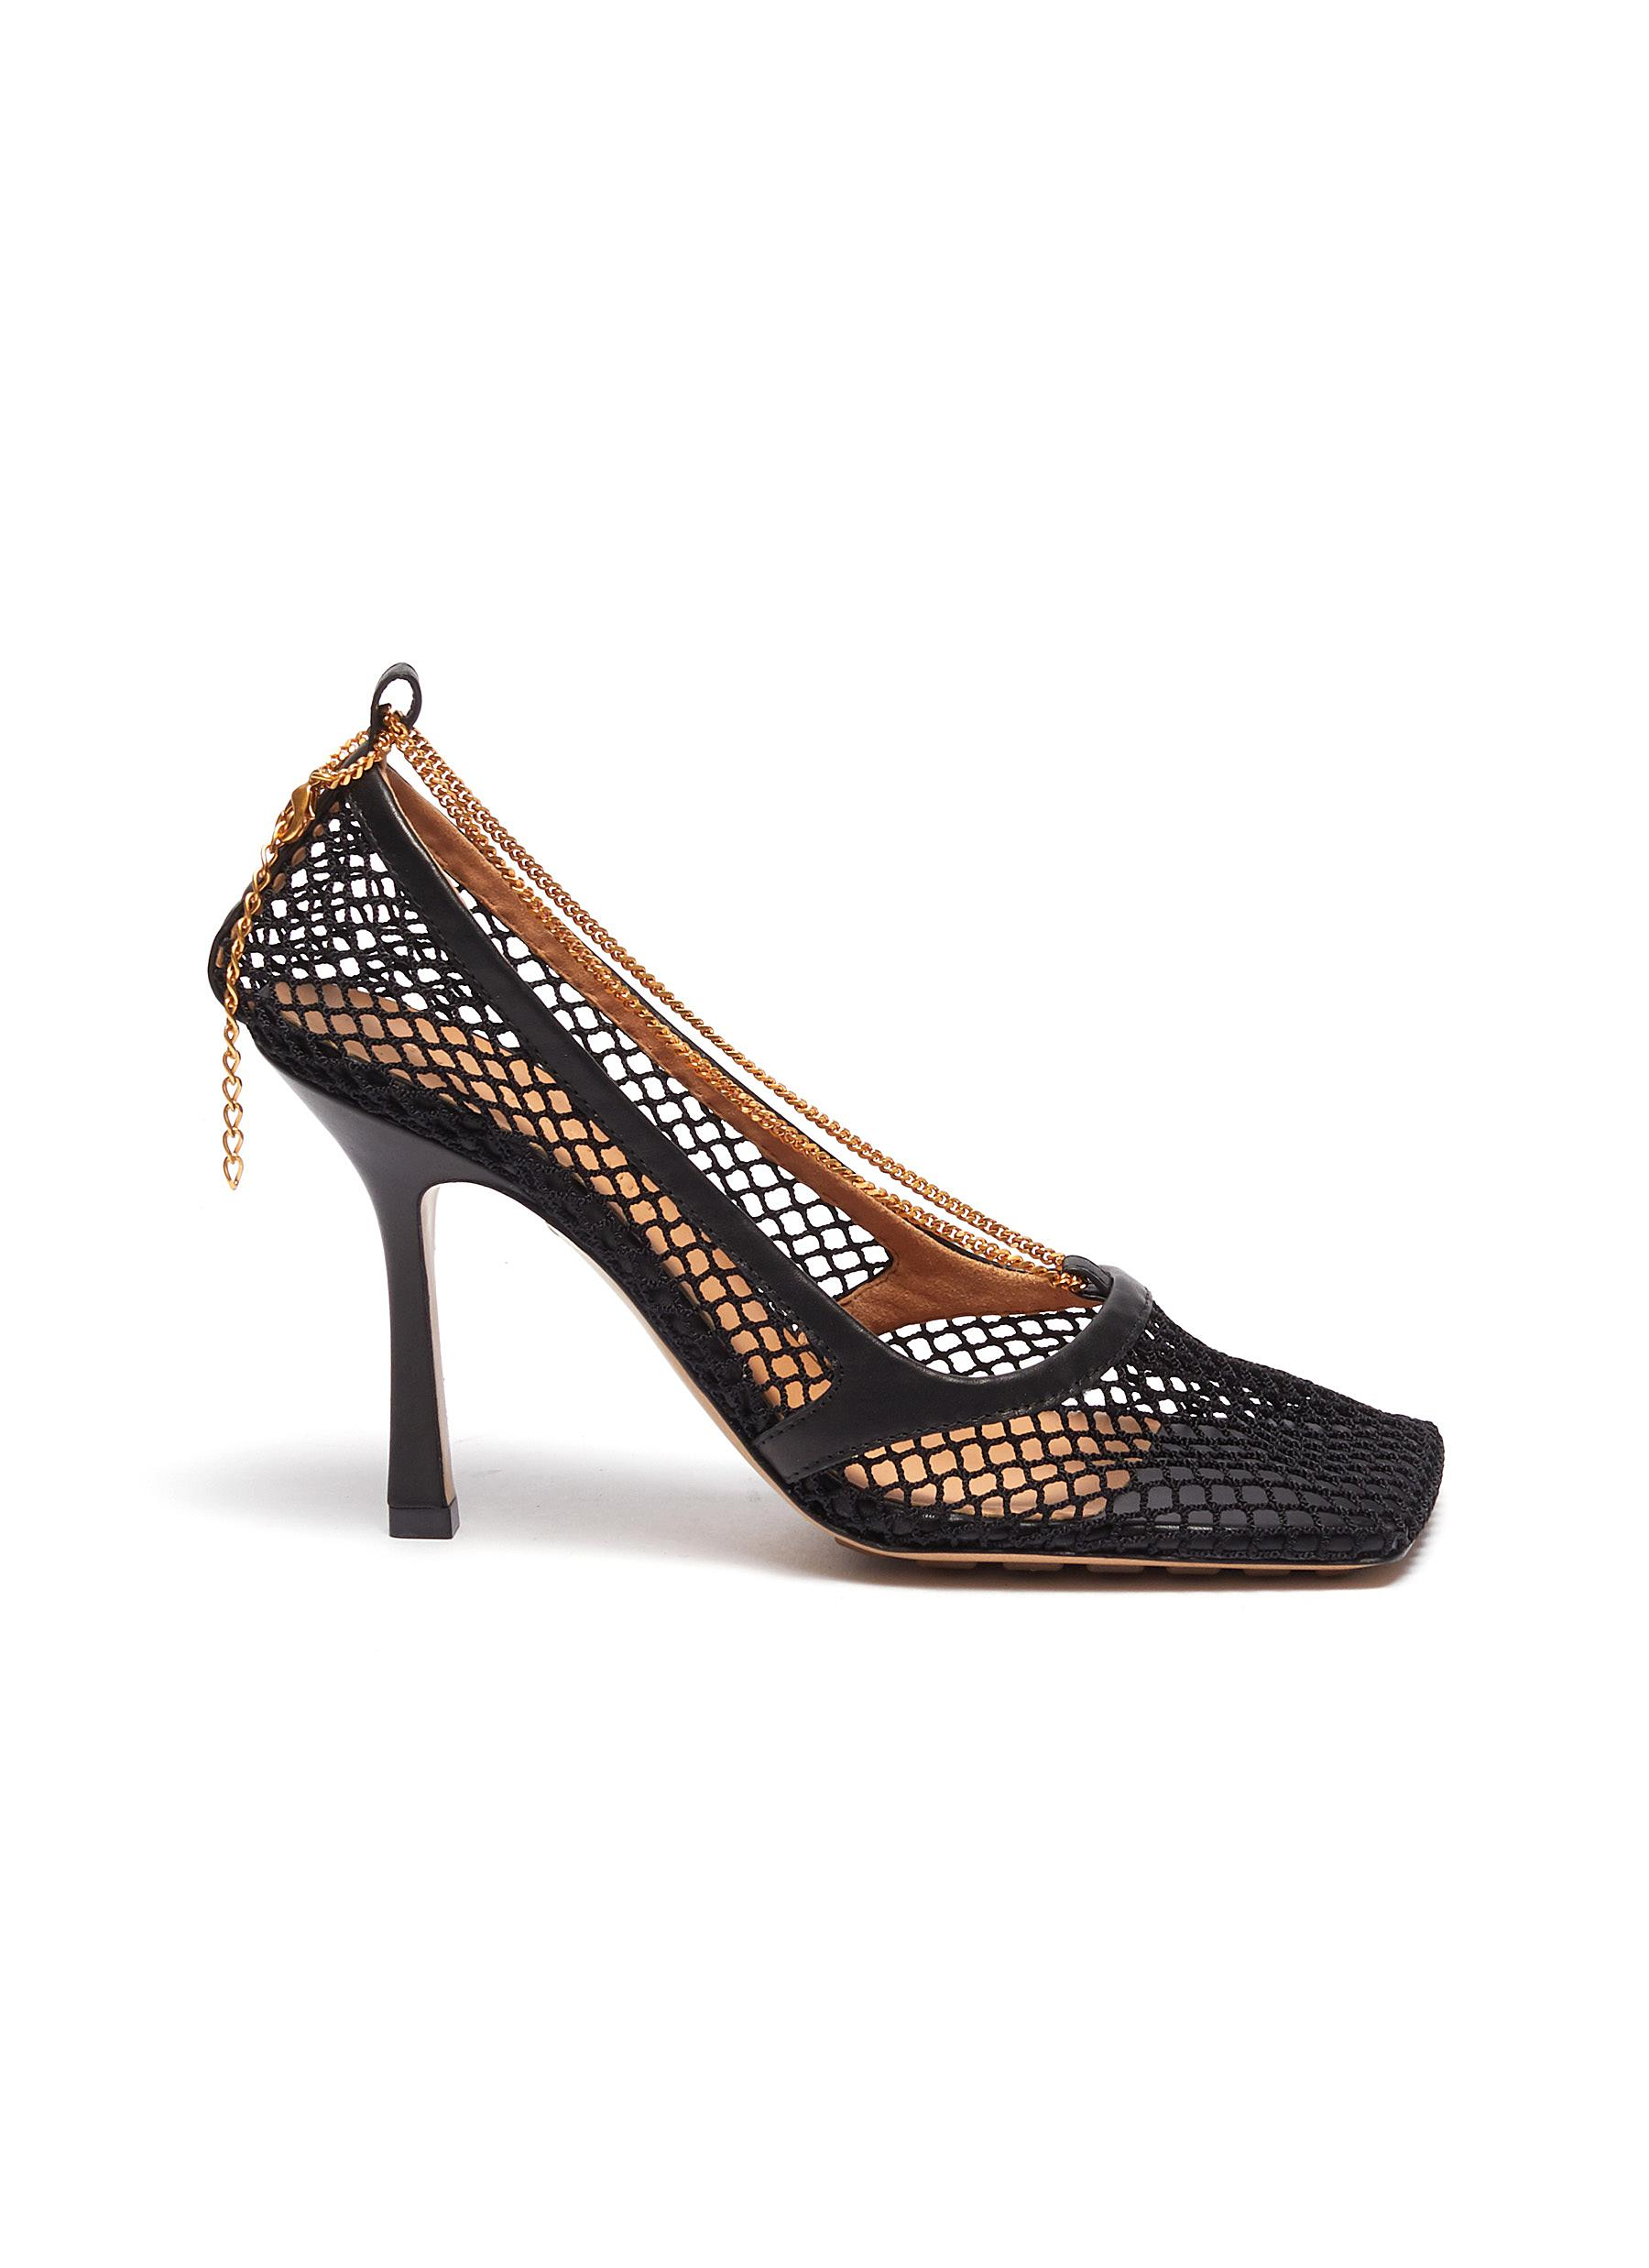 Bottega Veneta  Anklet leather trim fishnet pumps